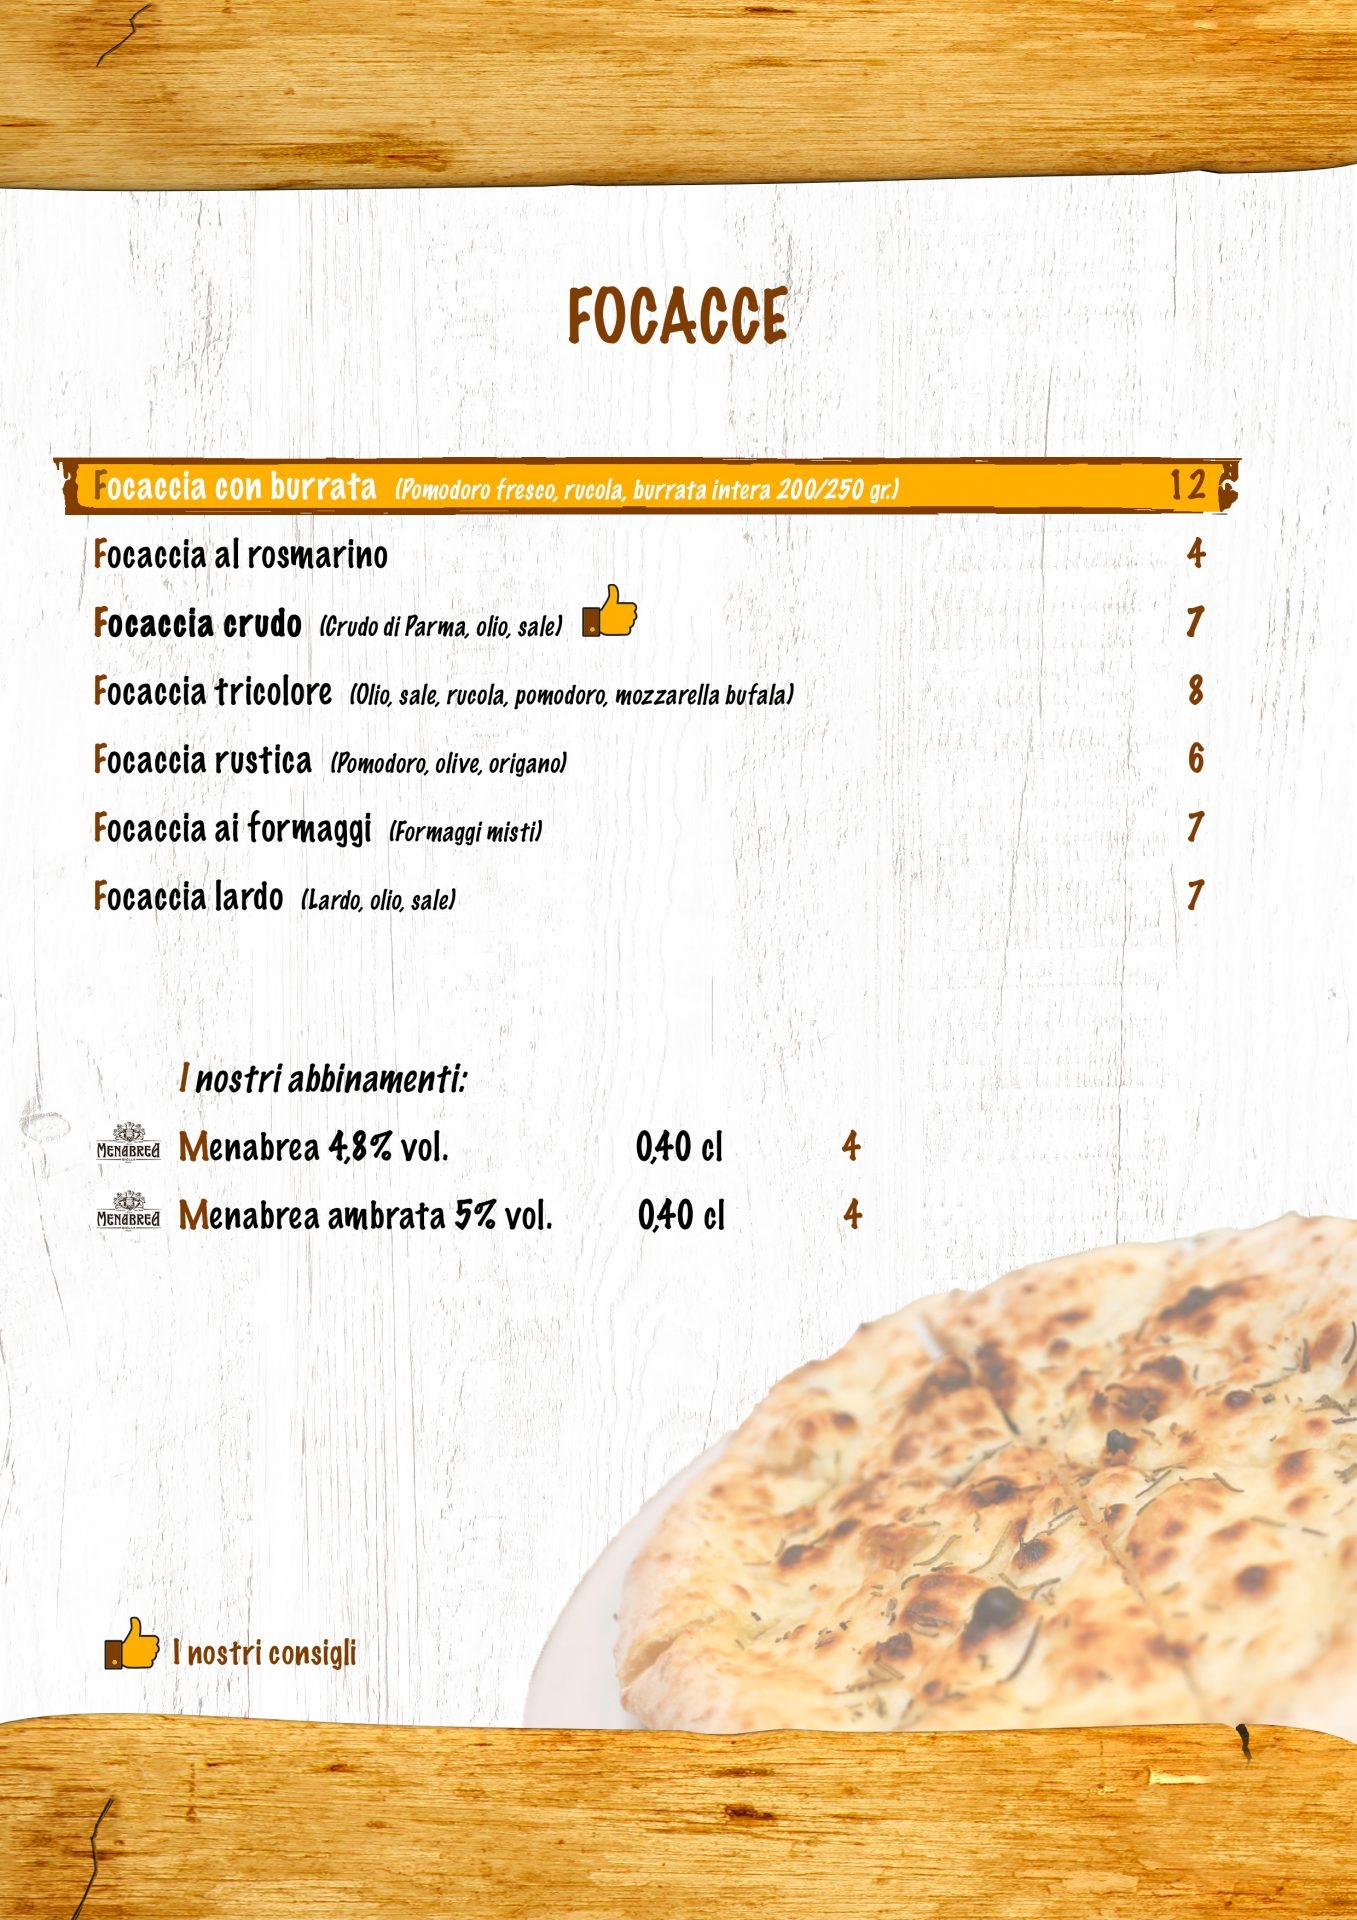 FOCACCE menù casale 93-7